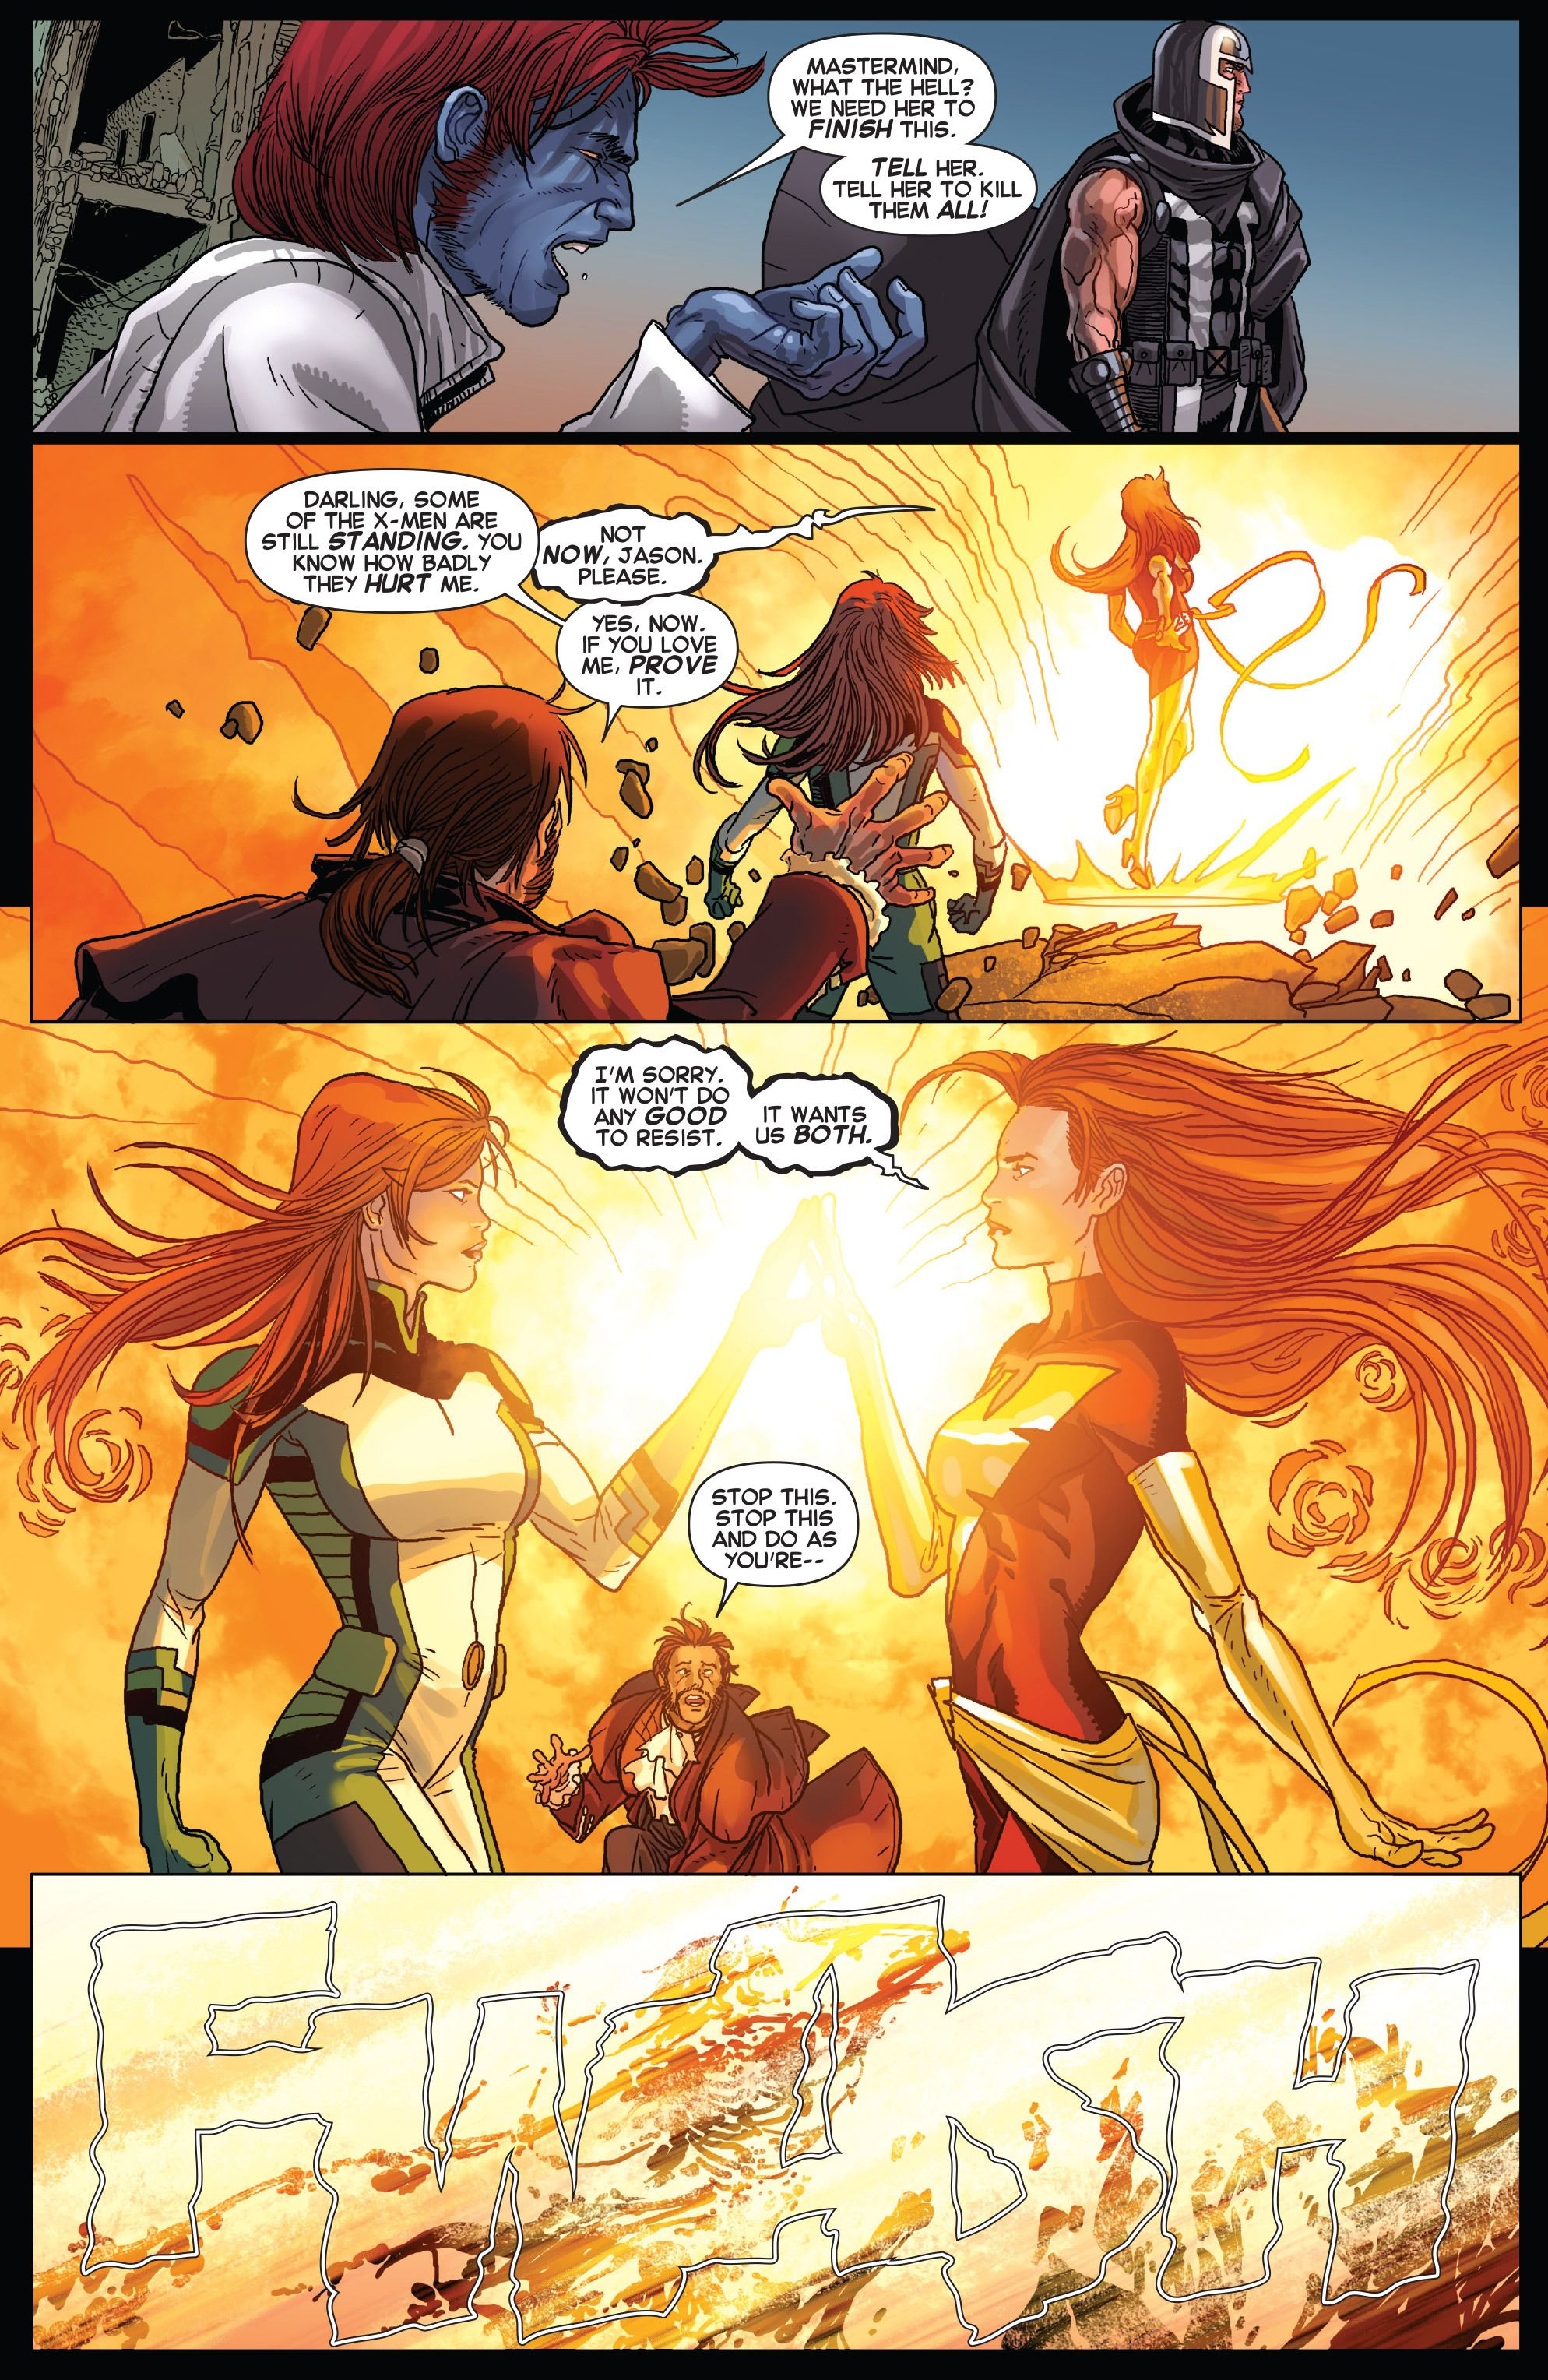 Http Static Comicvine Com Uploads Original 11114 111140025 4237166 X Men No More Humans 087 Jpg Marvel Jean Grey Jean Grey Phoenix Jean Grey Xmen